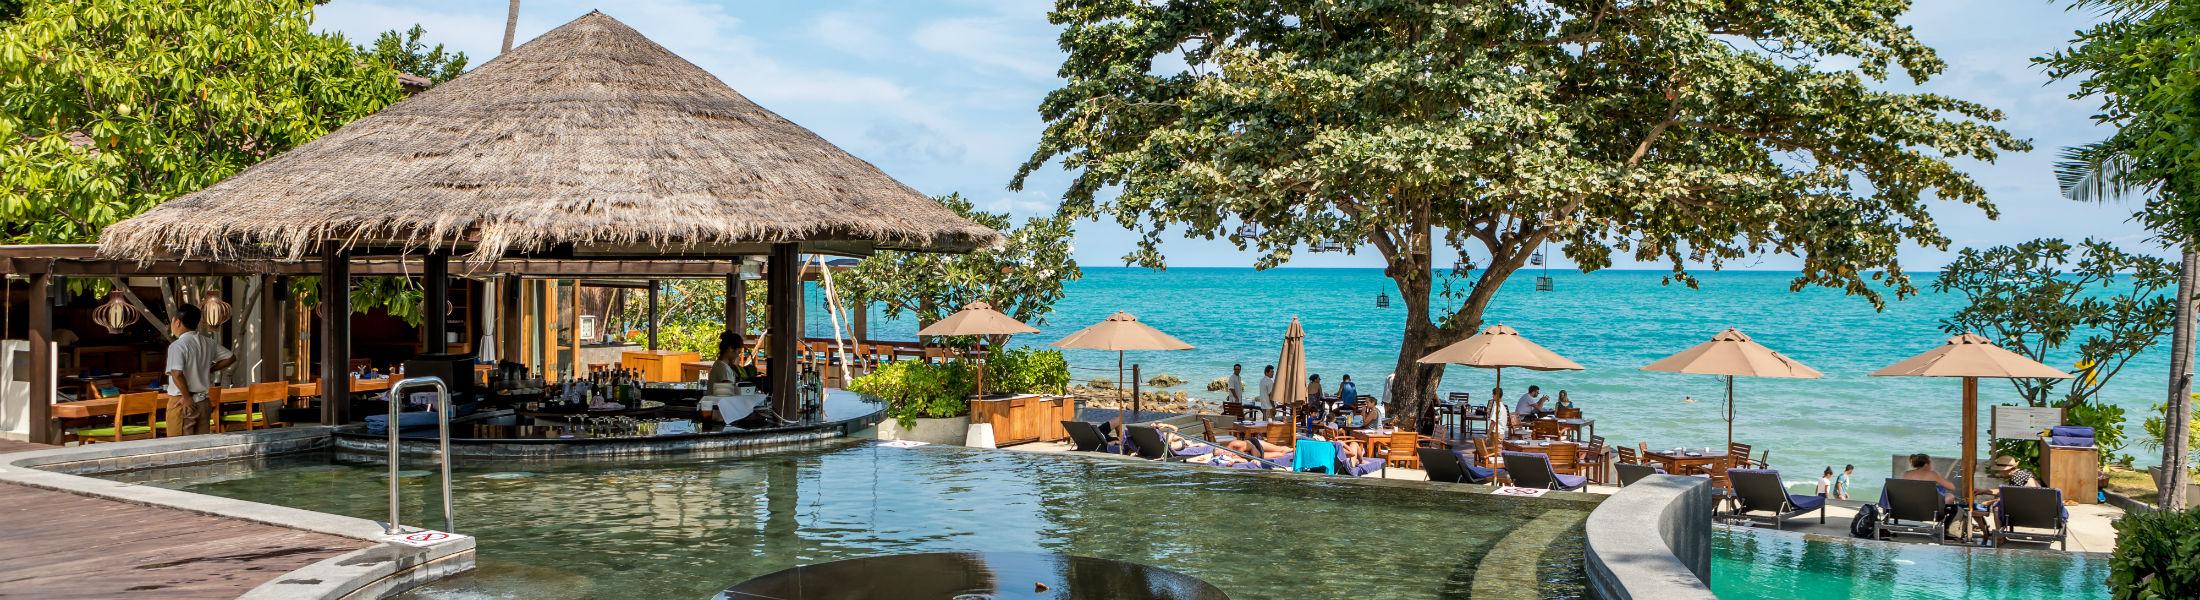 Swim up bar at the Outrigger koh Samui beach resort